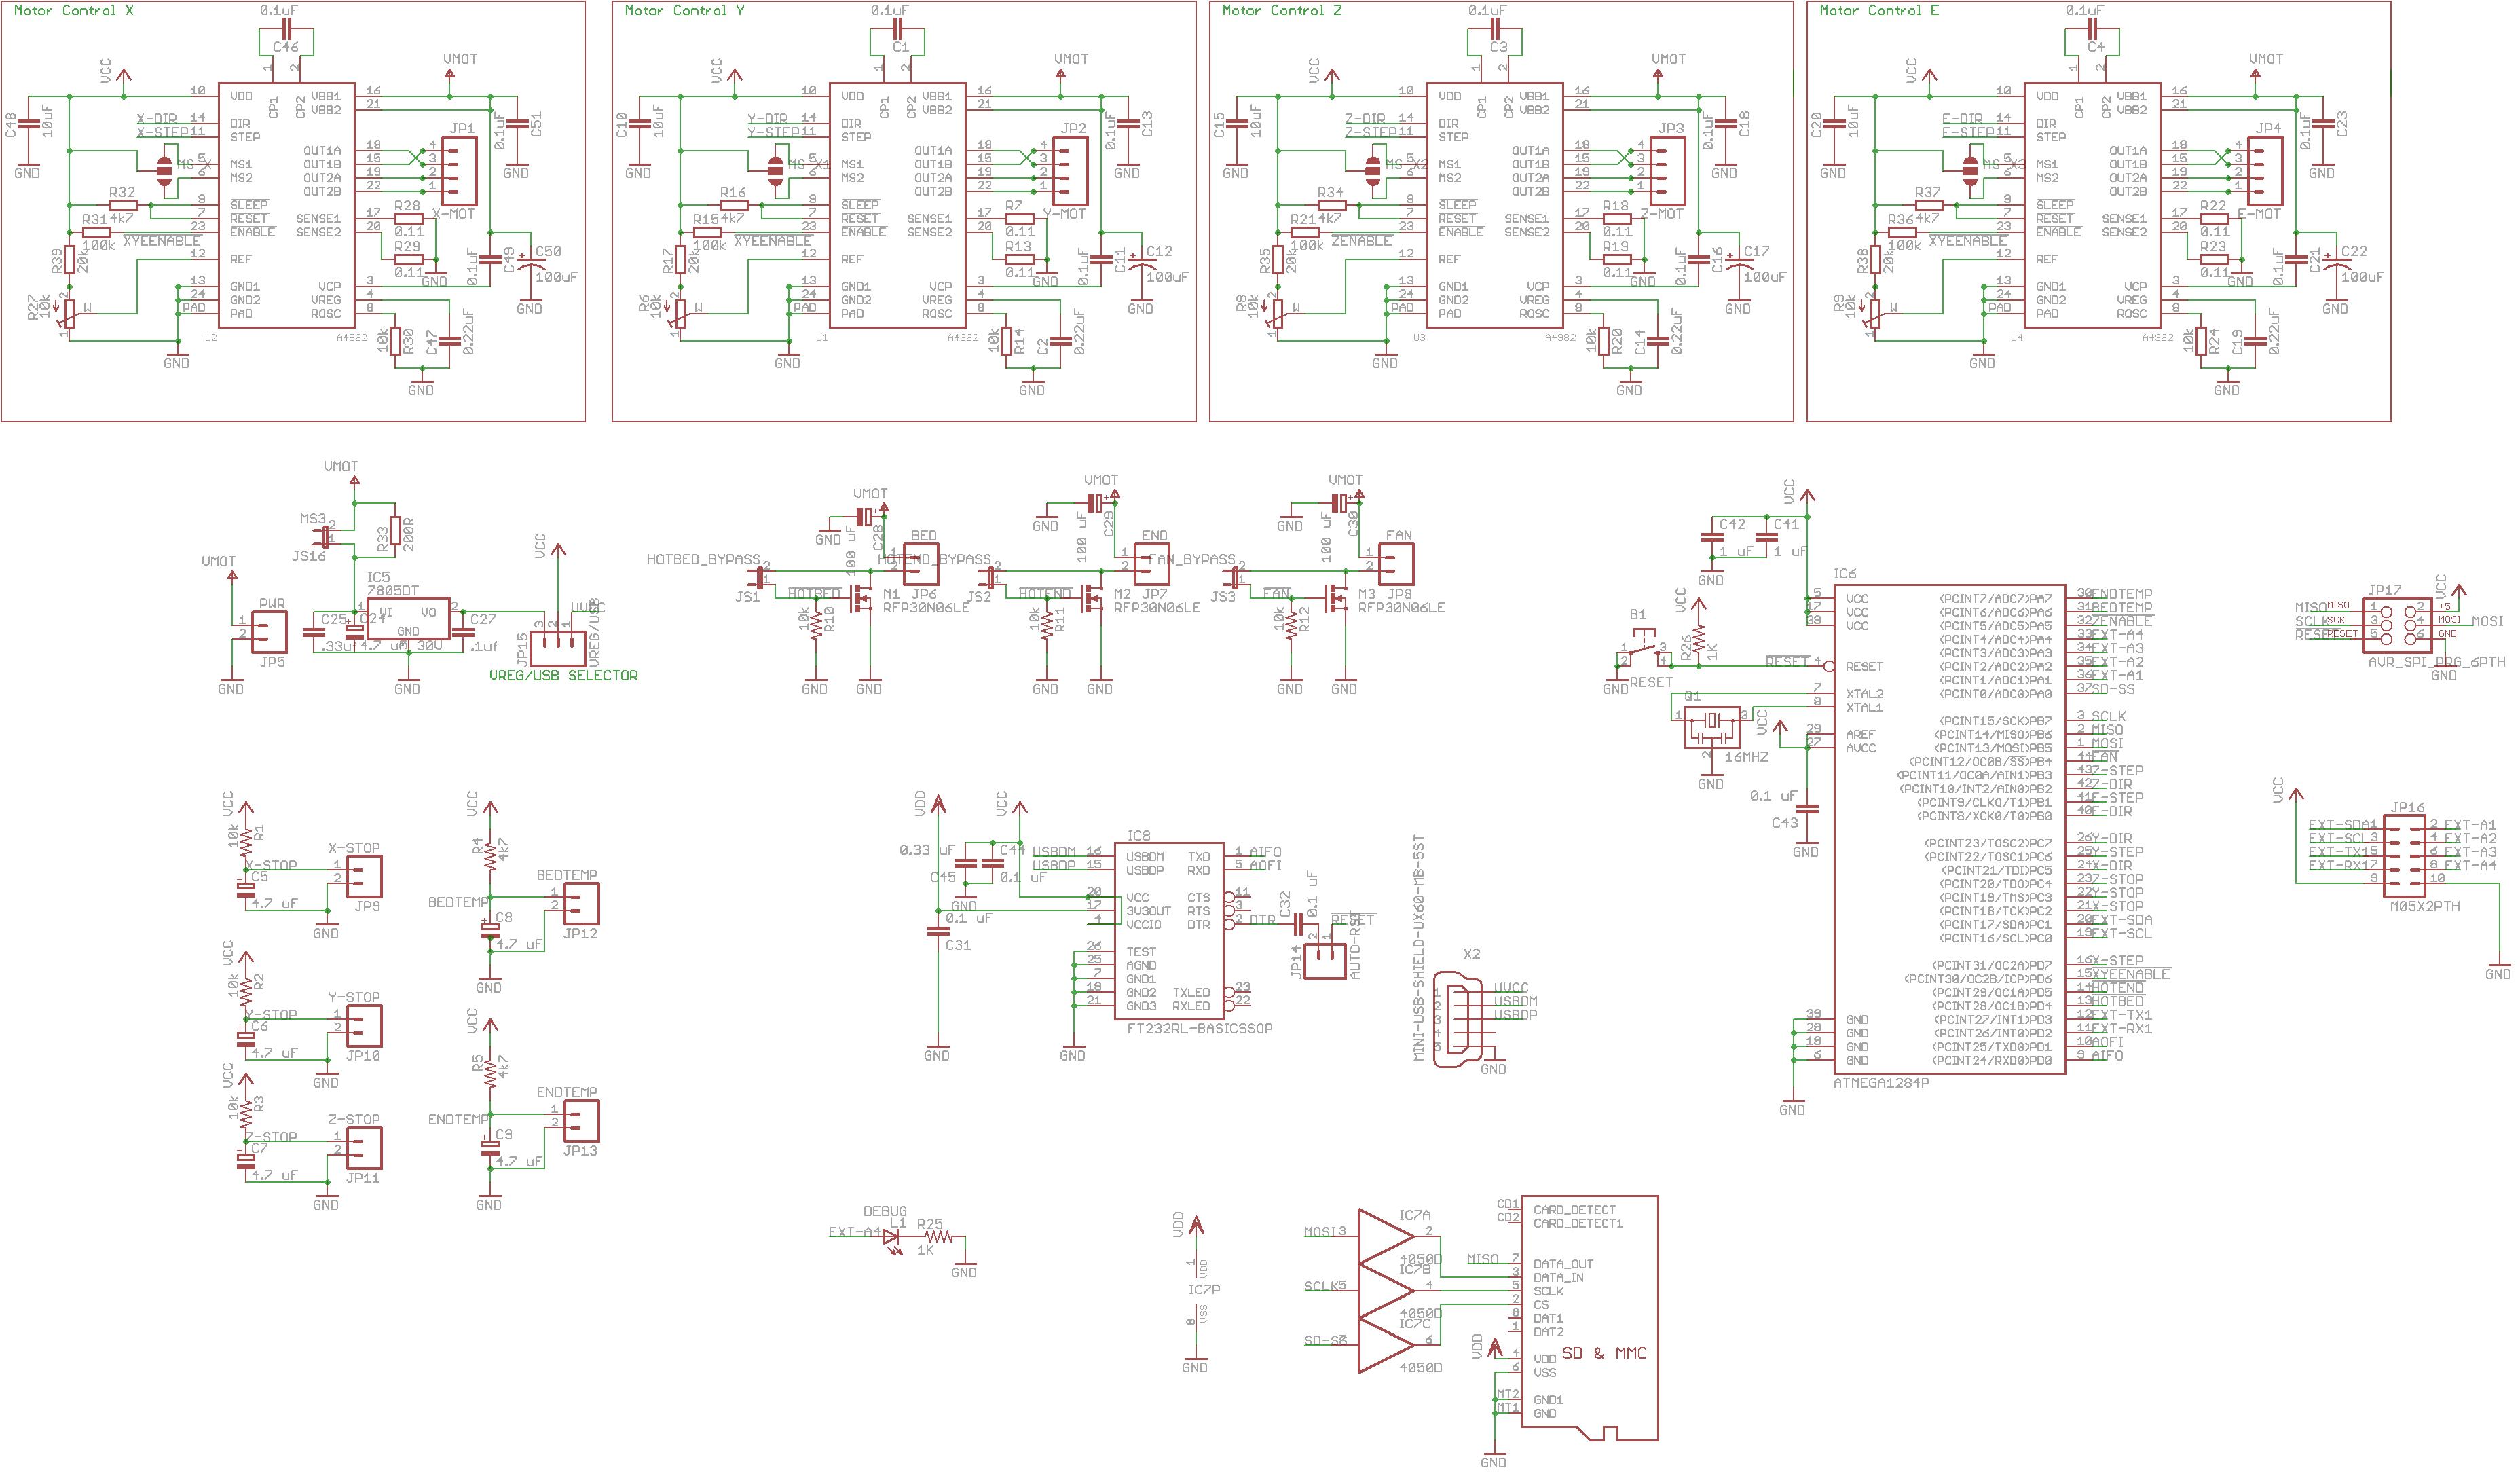 http://reprap.org/mediawiki/images/7/7d/Melzi-circuit.png